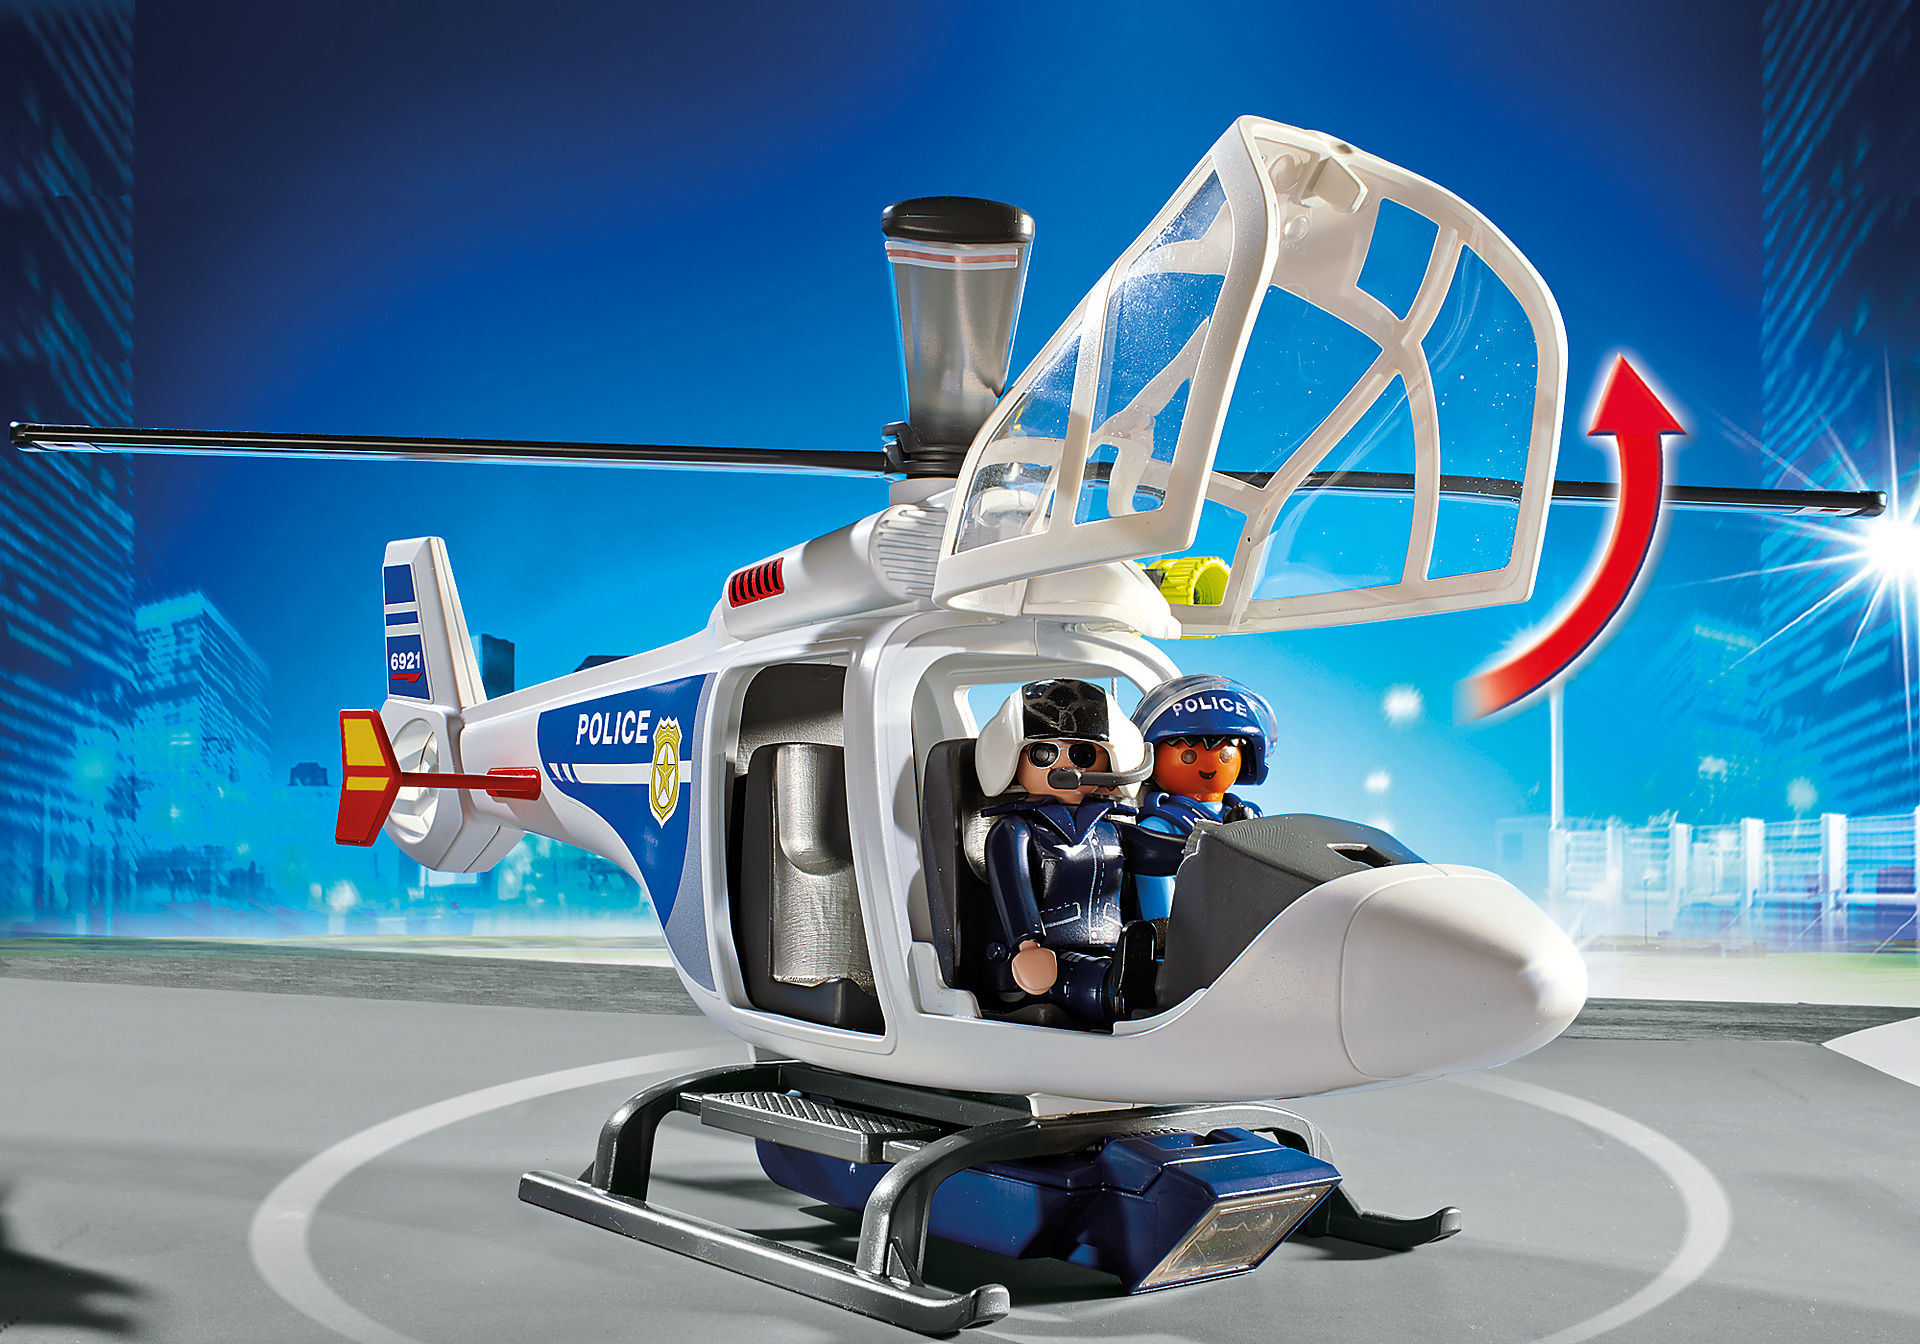 6921 Helicóptero de Policía con Luces LED zoom image4